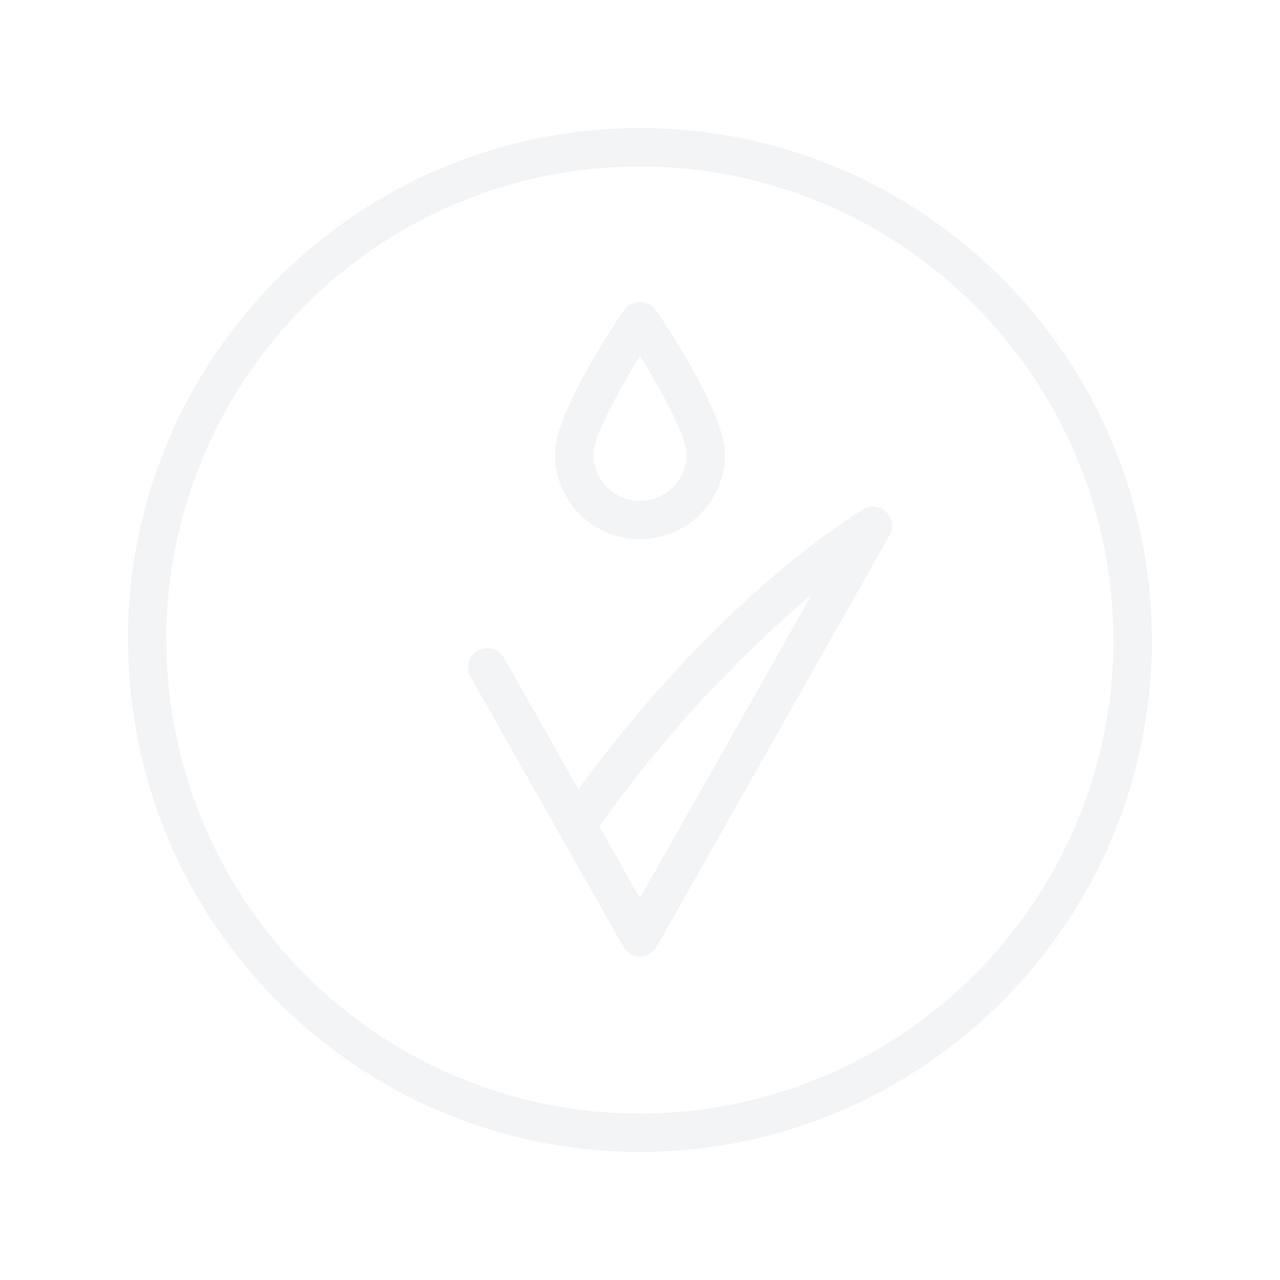 ELIZABETH ARDEN Flawless Finish Bouncy Makeup 9g